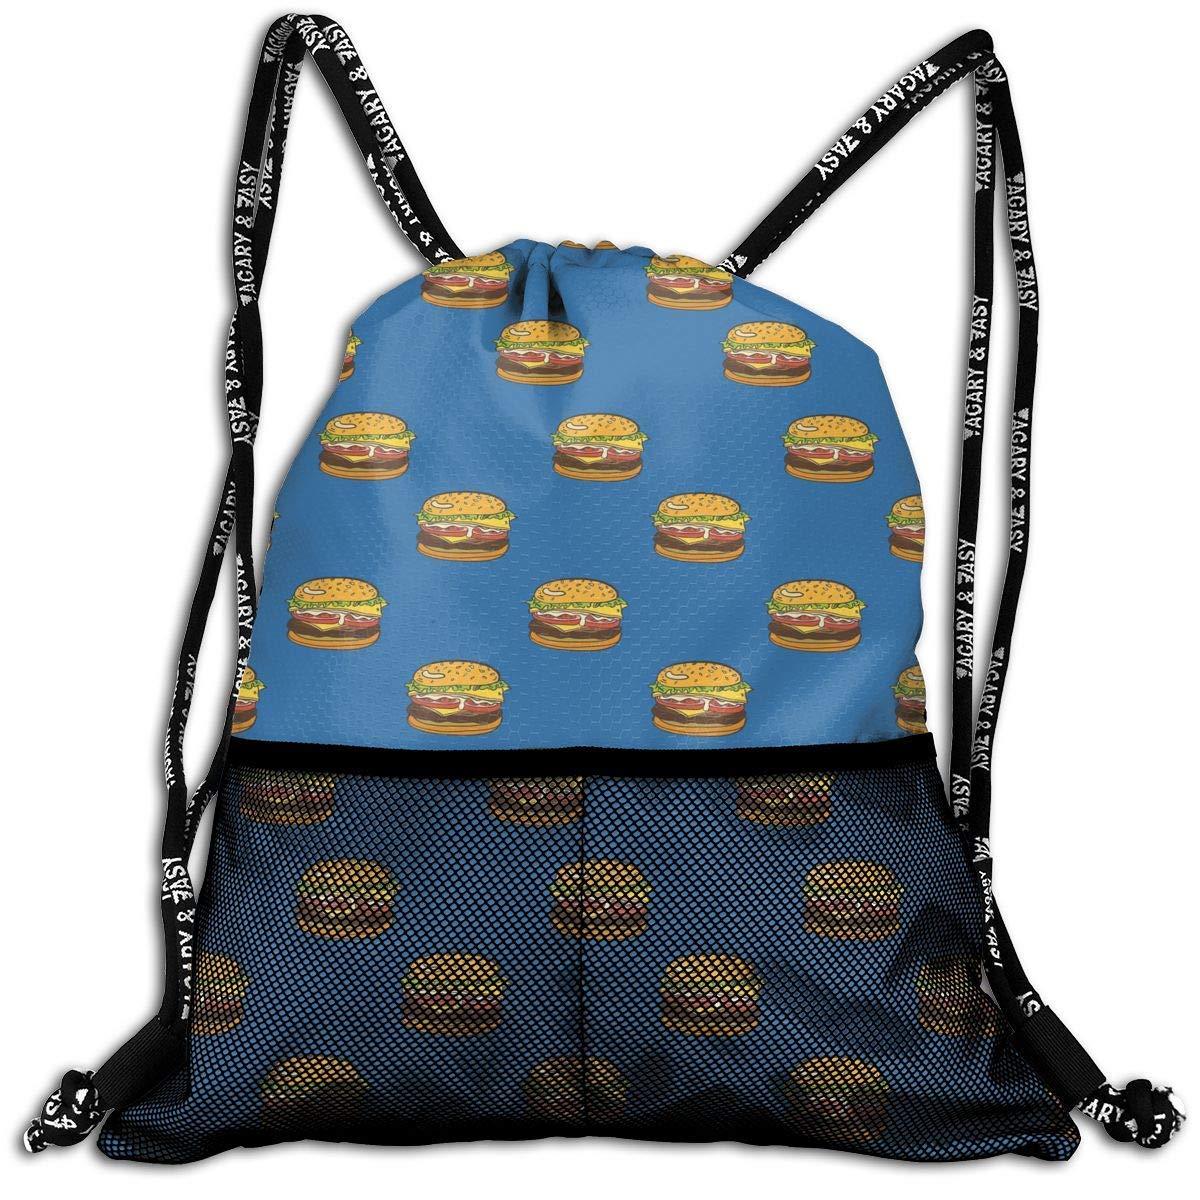 Hipiyoled Fries Burgers FUUNY Cartoon Pattern Durable Sport Drawstring Backpack for School Soccer Yoga